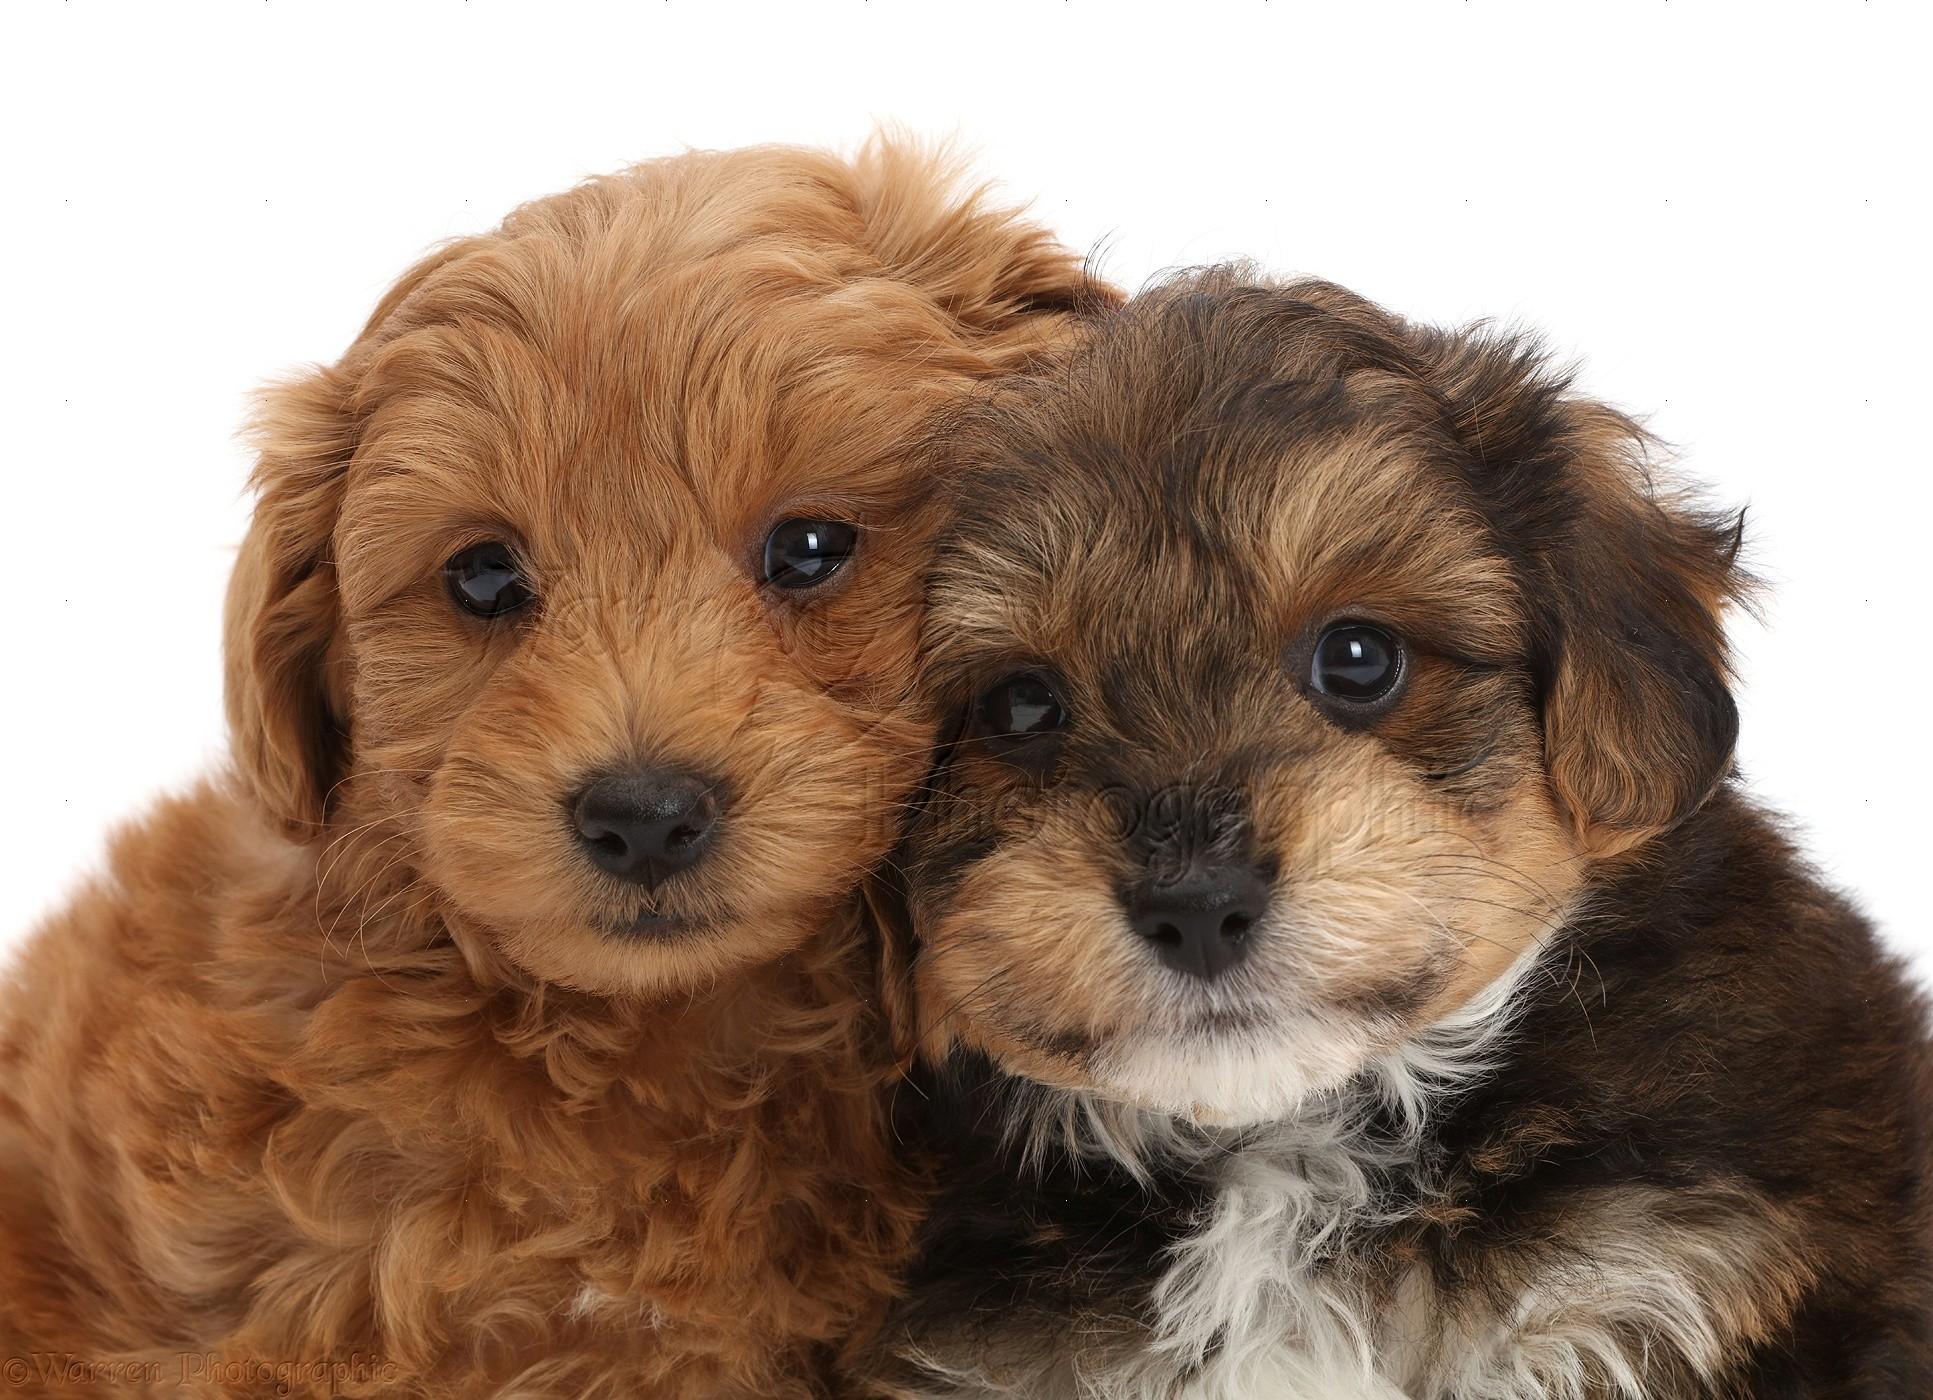 Dog Two Cavapoo Puppies Photo Wp47357